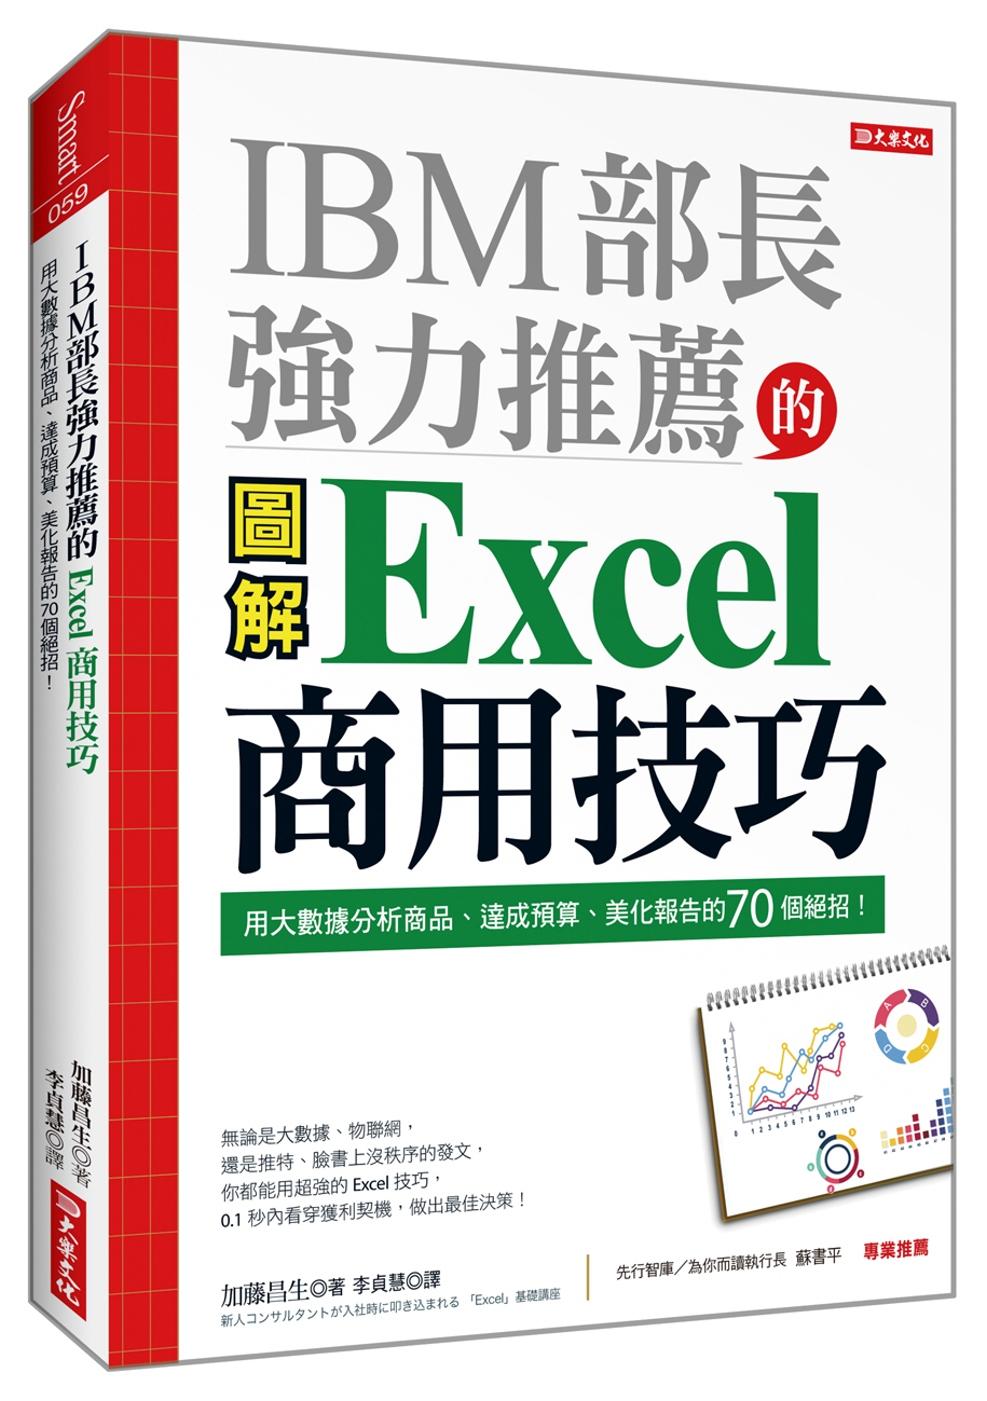 IBM部長強力推薦的Excel商用技巧:用大數據分析商品、達成預算、美化報告的70個絕招!